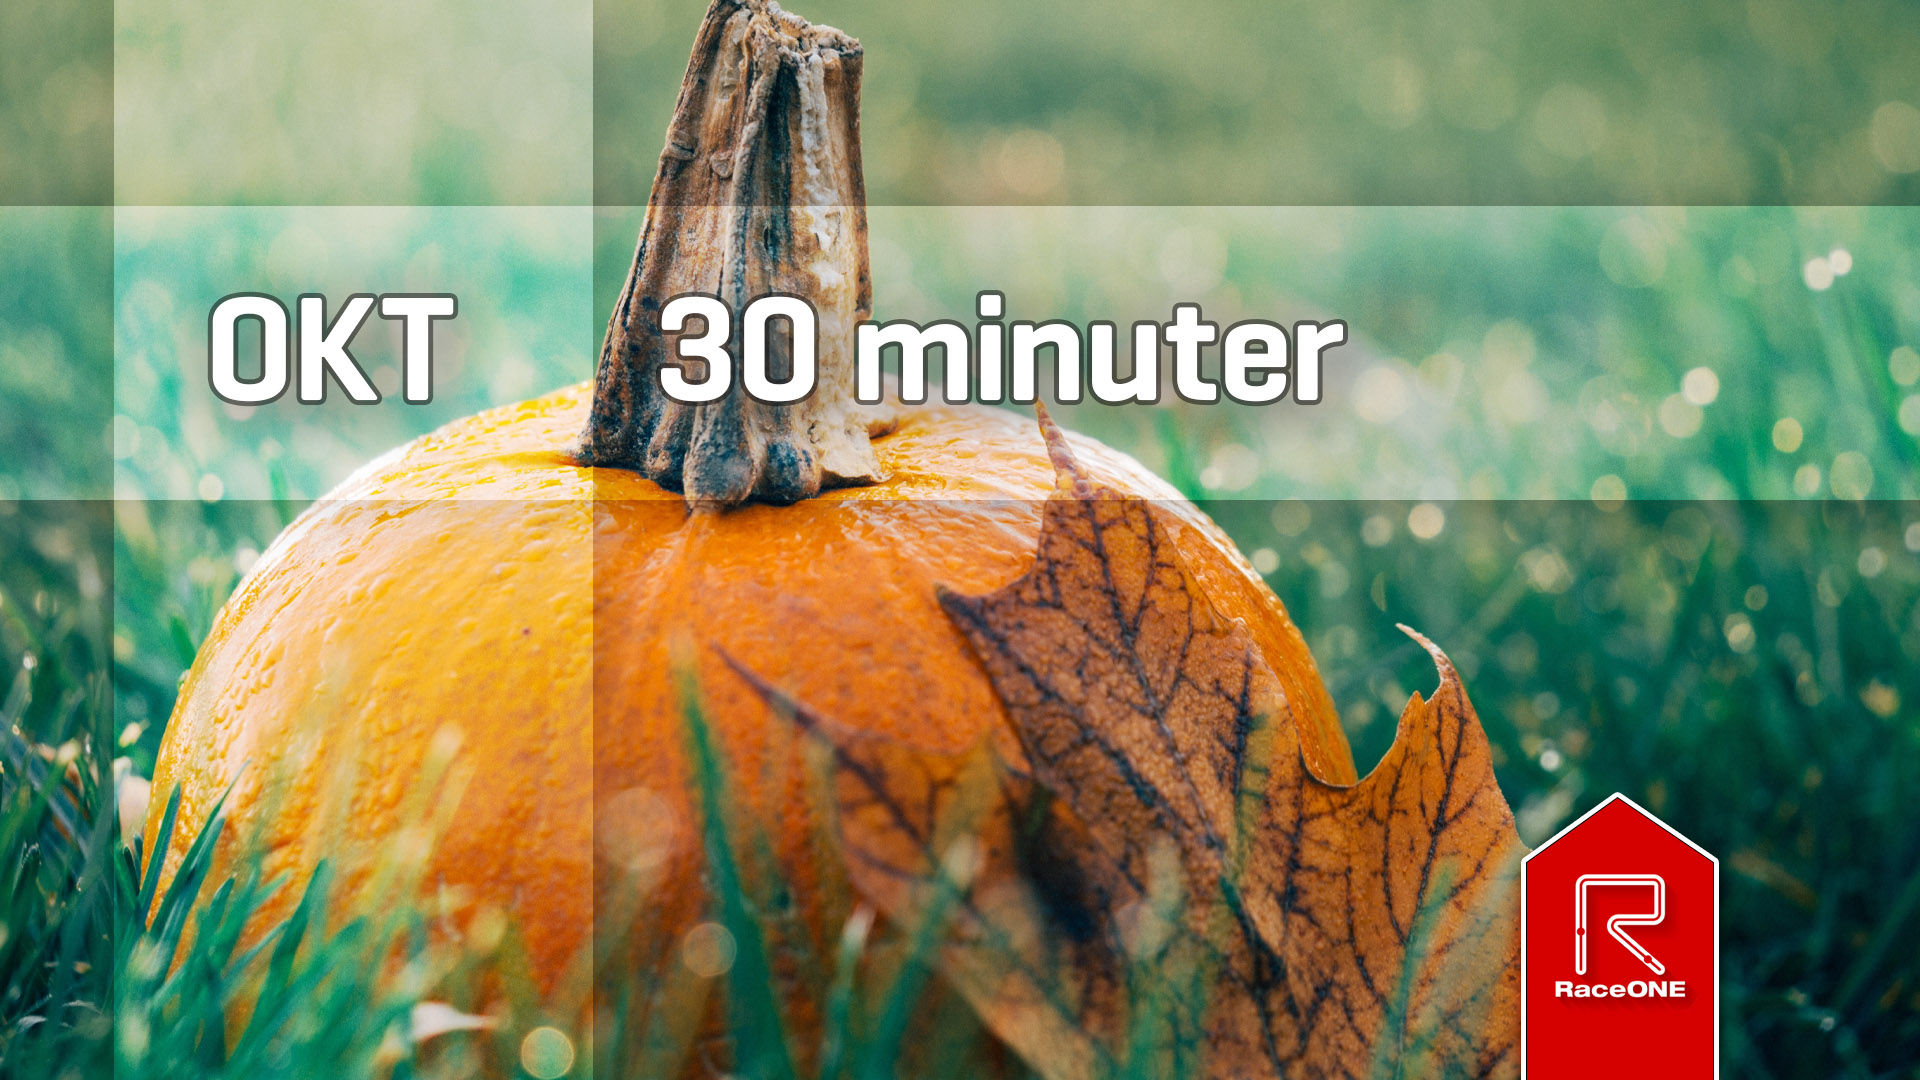 RaceONE - Oktober 30 minuter